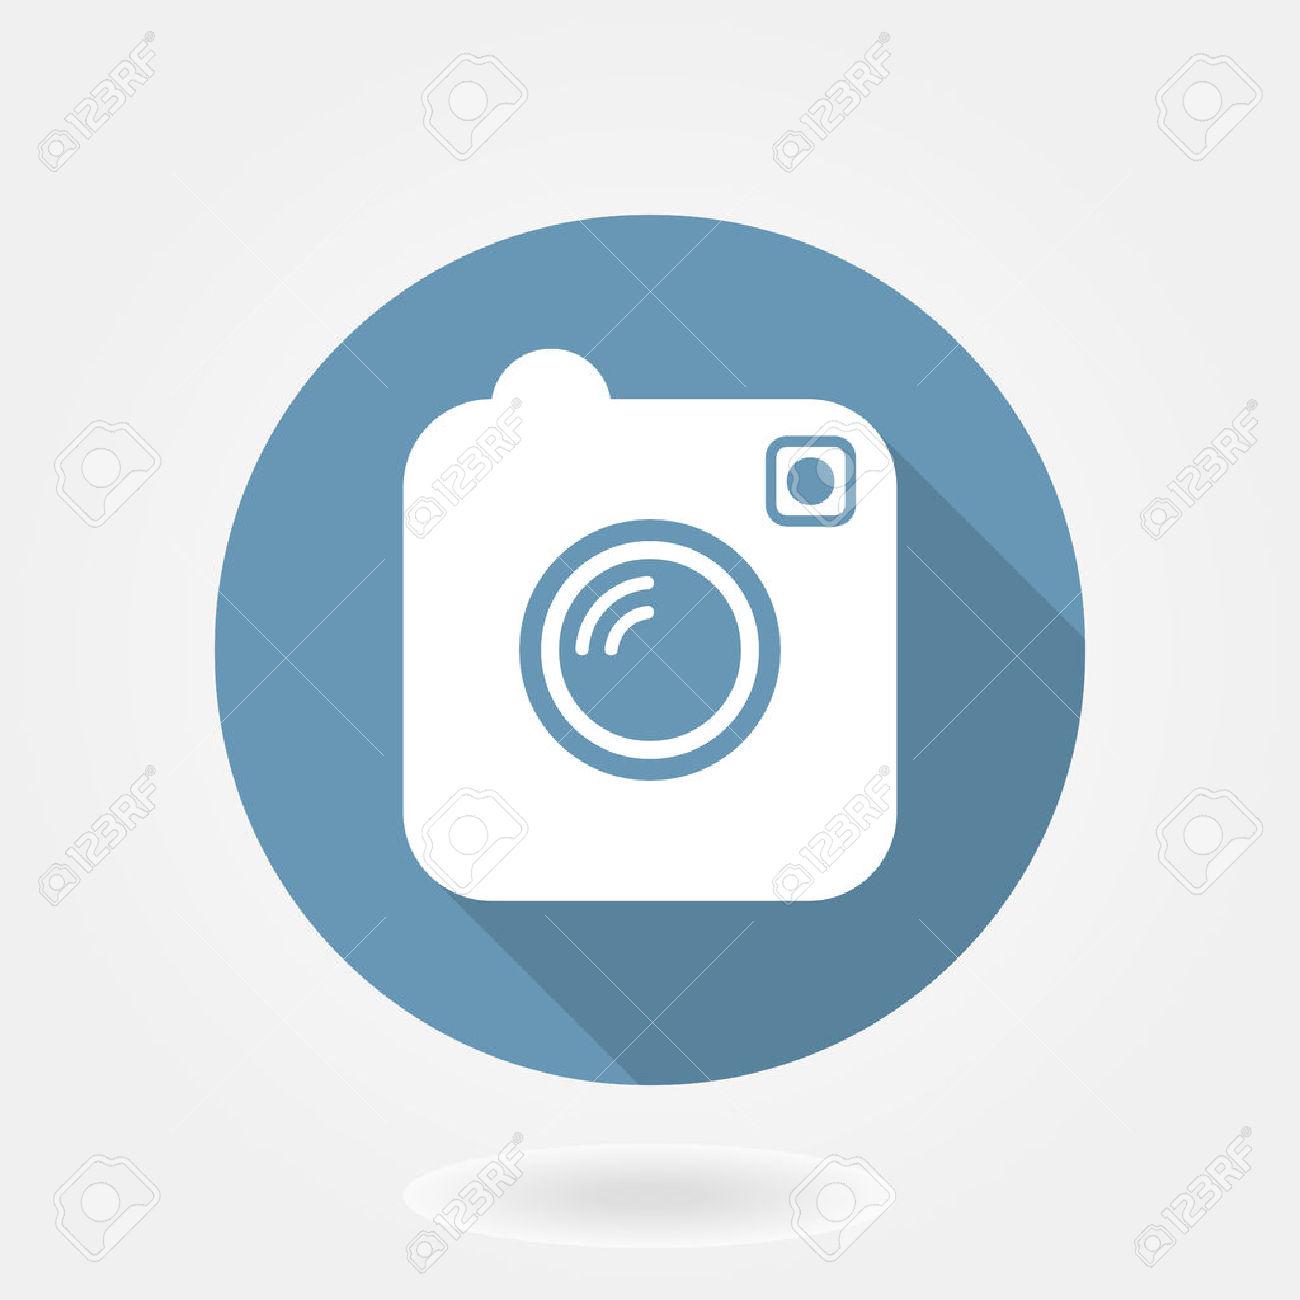 Instagram like clipart jpg freeuse library 232 Like Instagram Stock Vector Illustration And Royalty Free Like ... jpg freeuse library